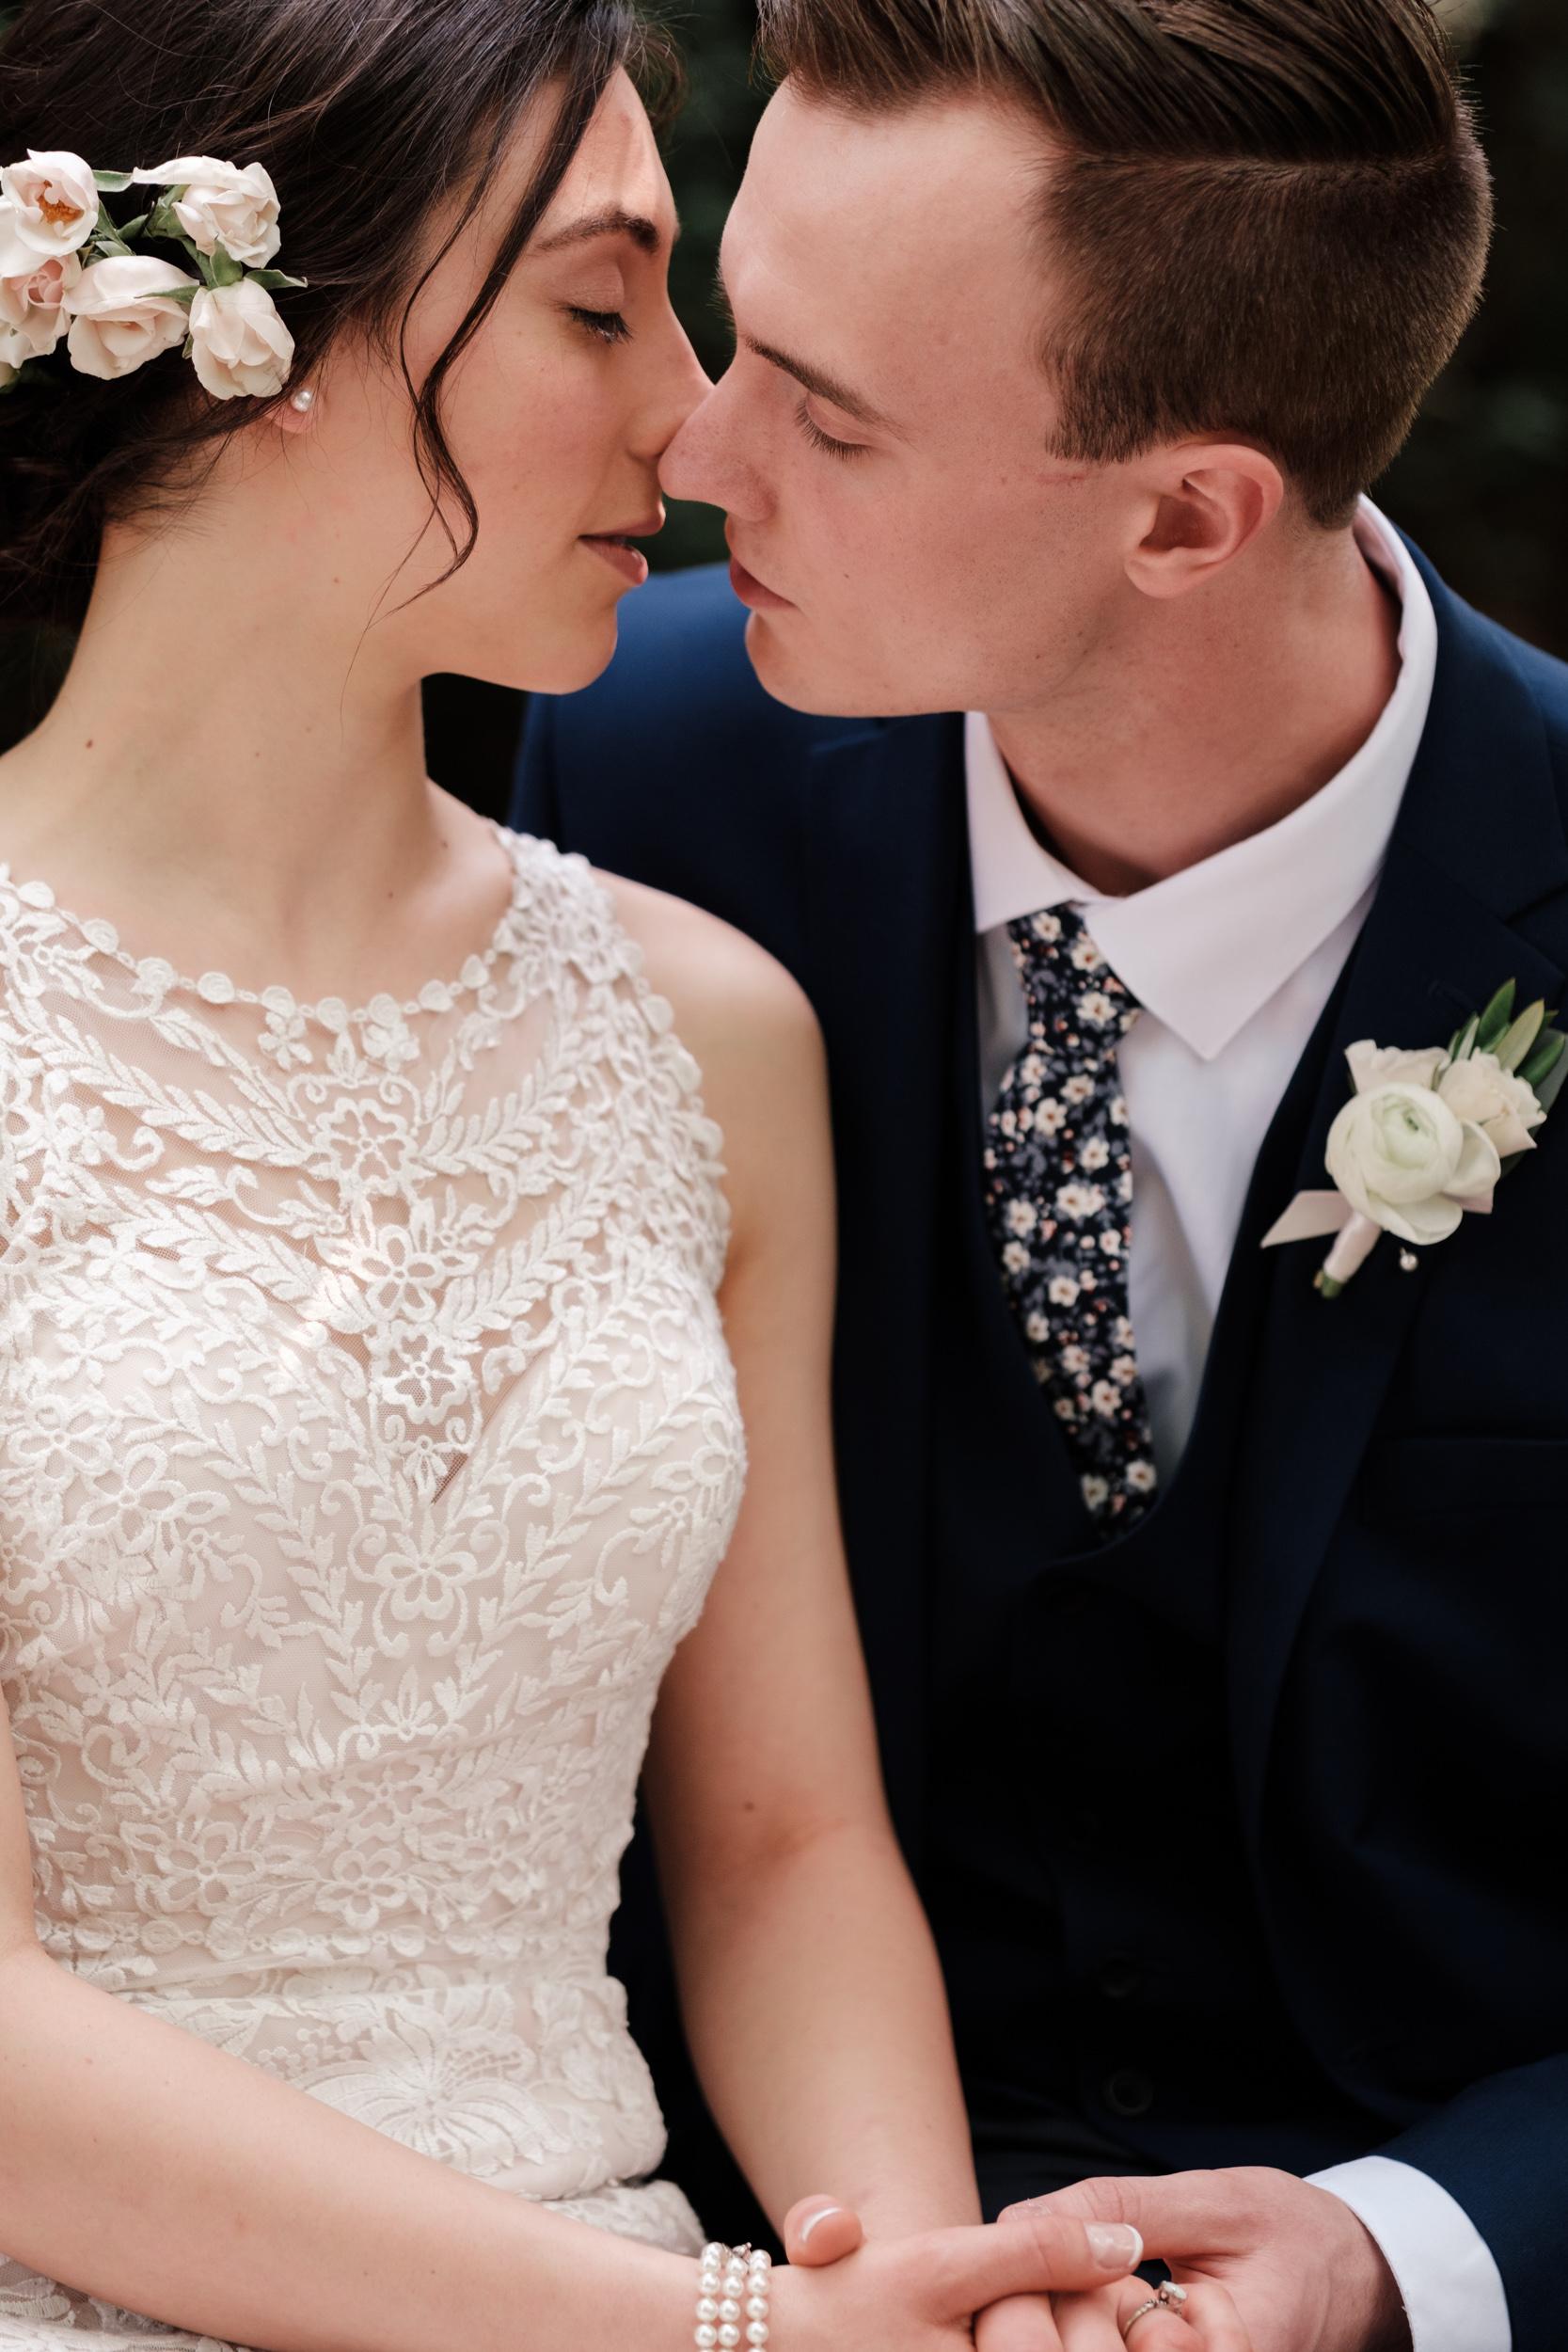 19-02 Paula Austin Megan Josh Weddings-2.jpg